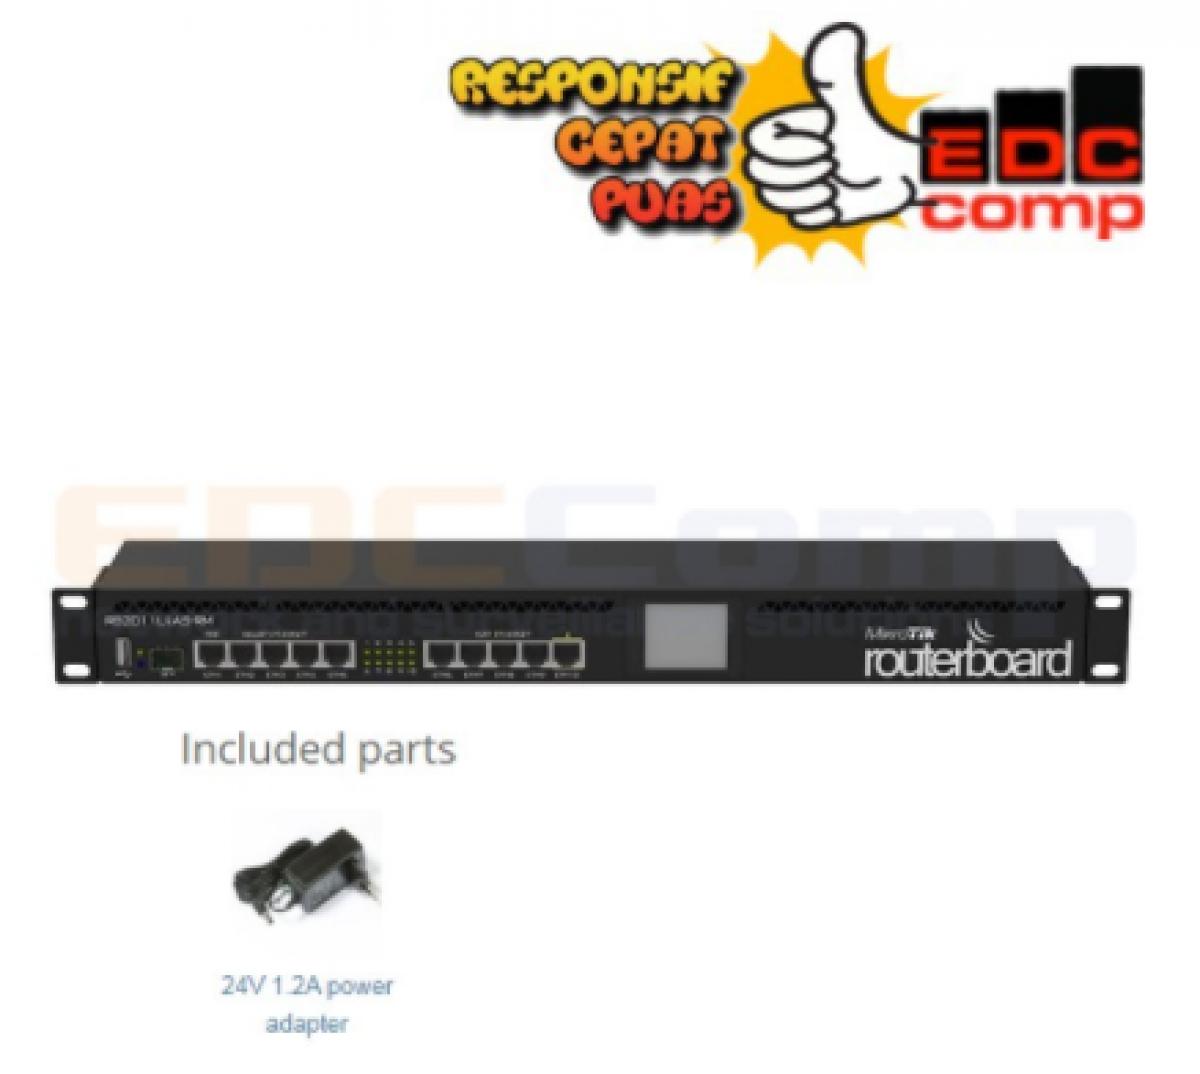 MikroTik Routerbord RB2011UiAS-RM / RB2011 UiAS RM / RB2011UiAS - EdcComp